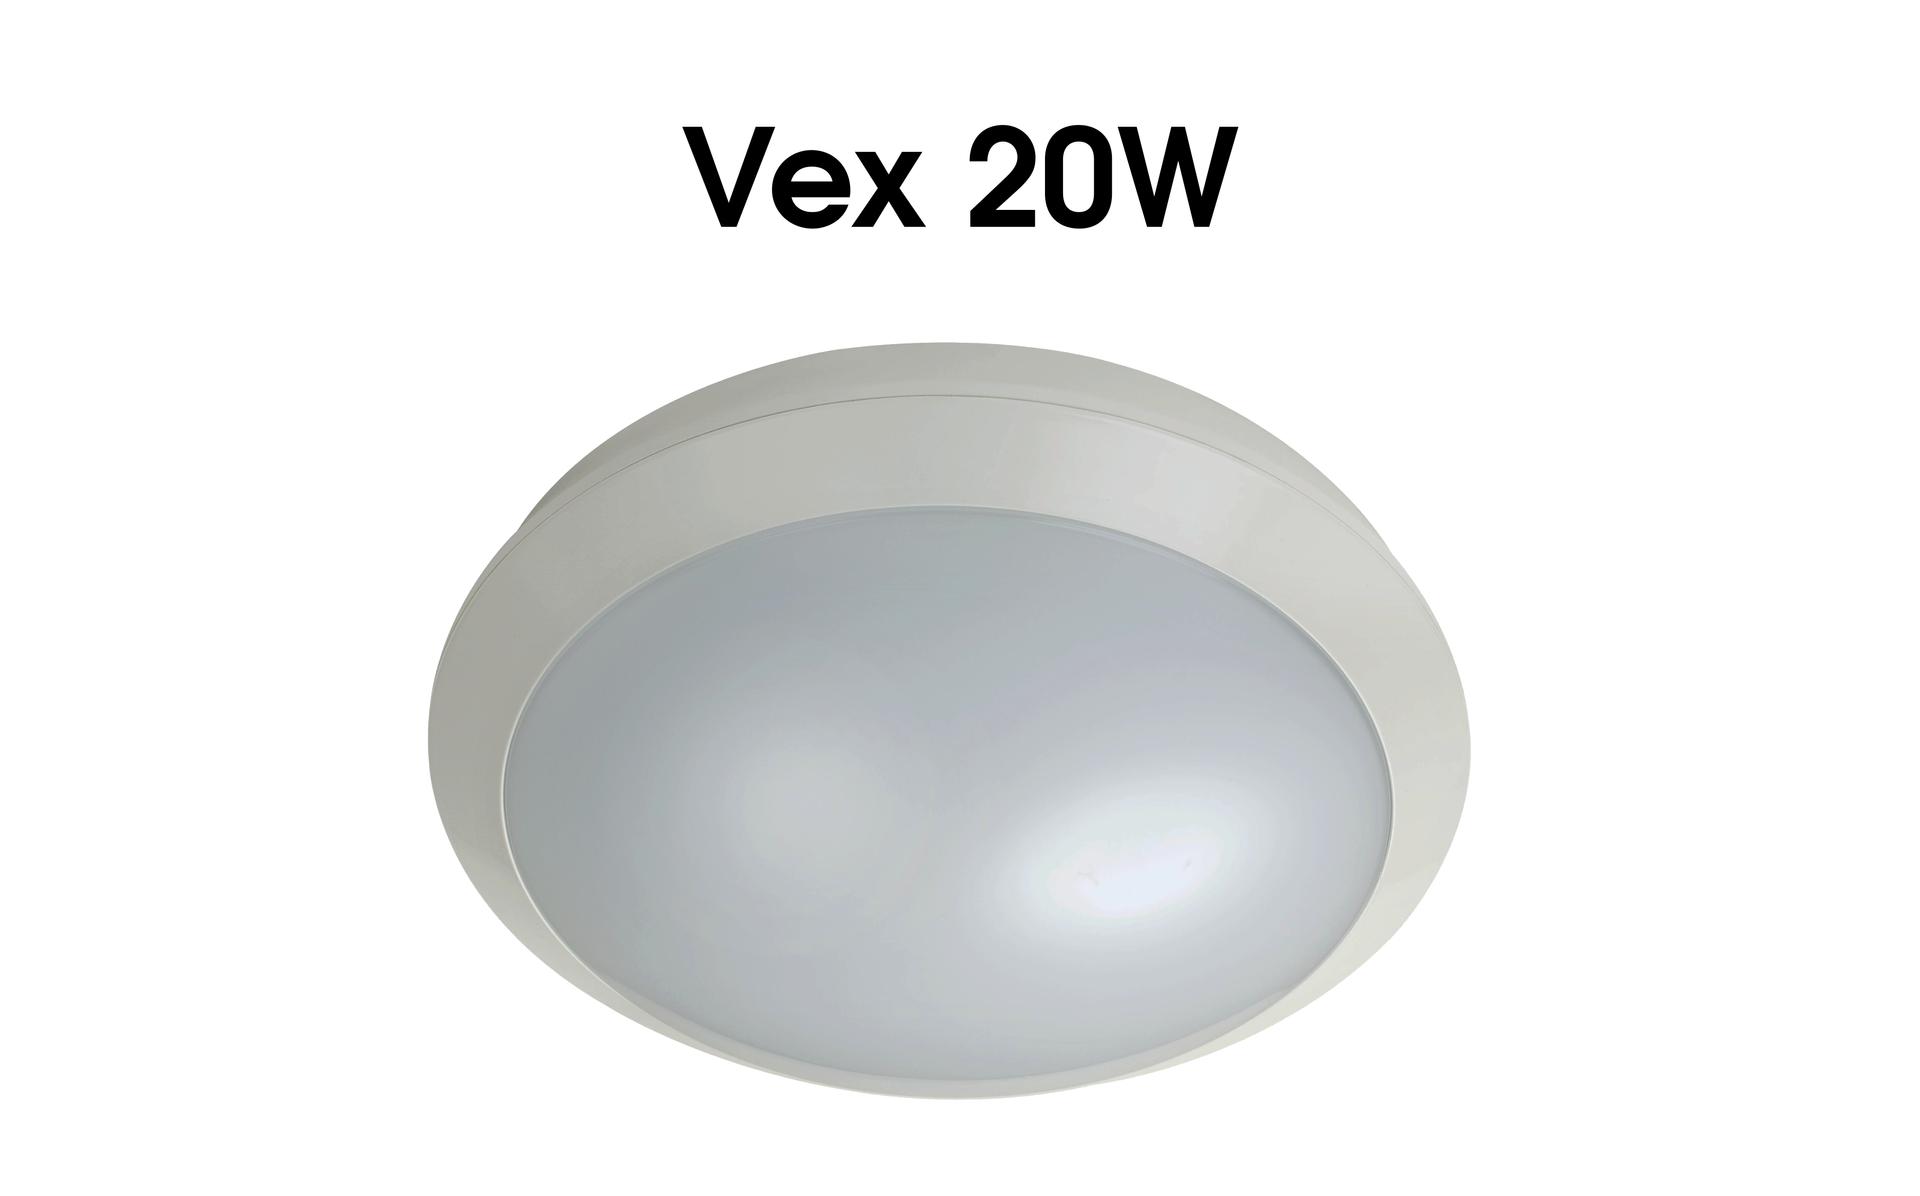 Vex Standard 360 Mobile-01.png